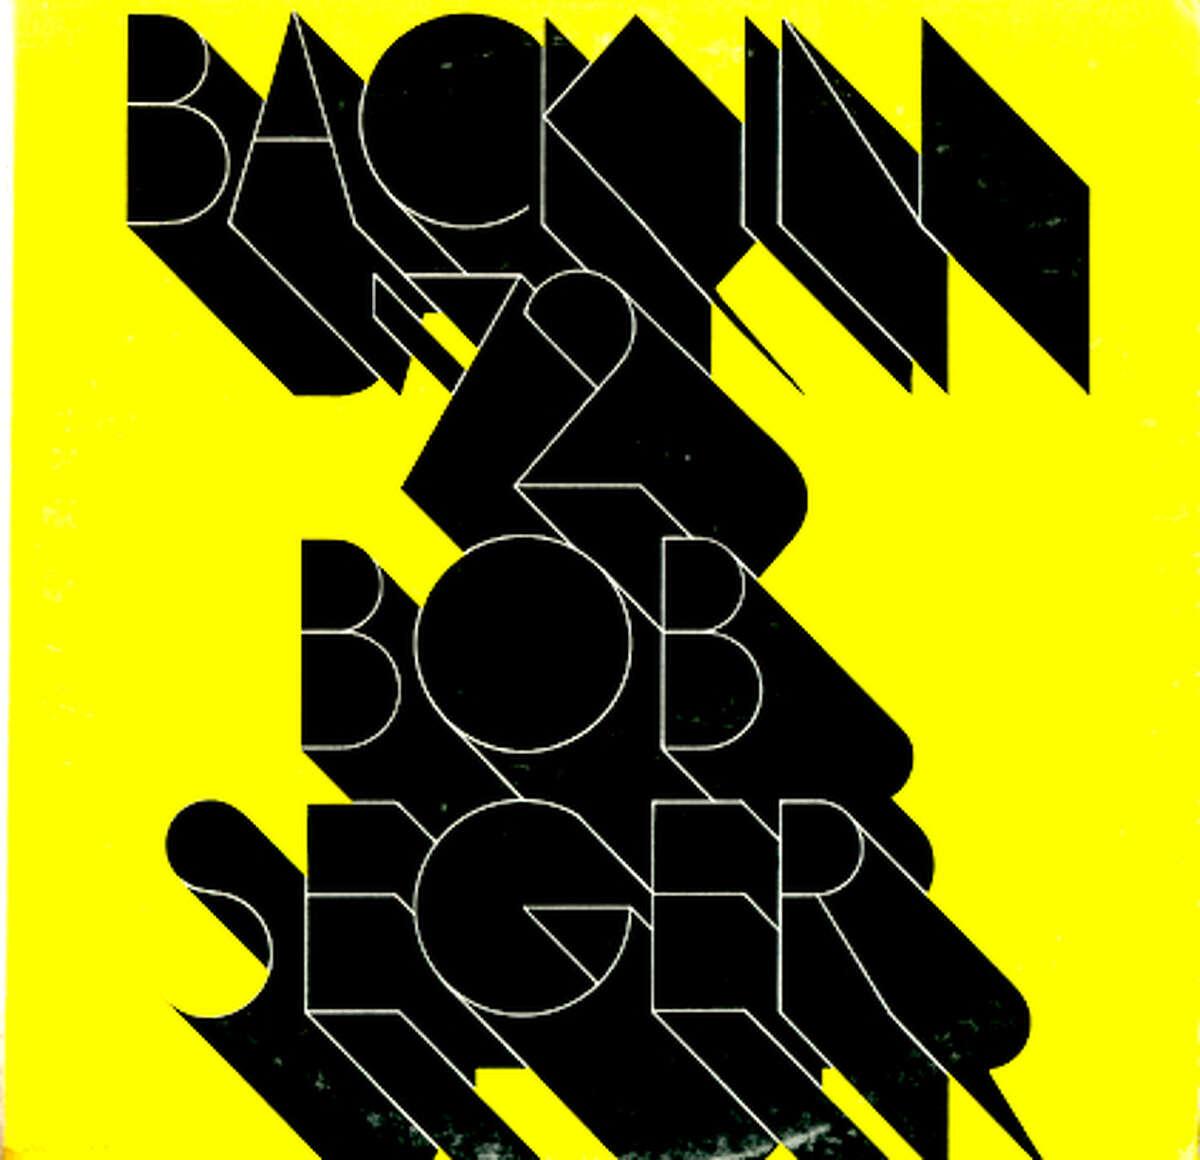 CDS31_05.JPG BOB SEGER: Back In �72. catagory 1